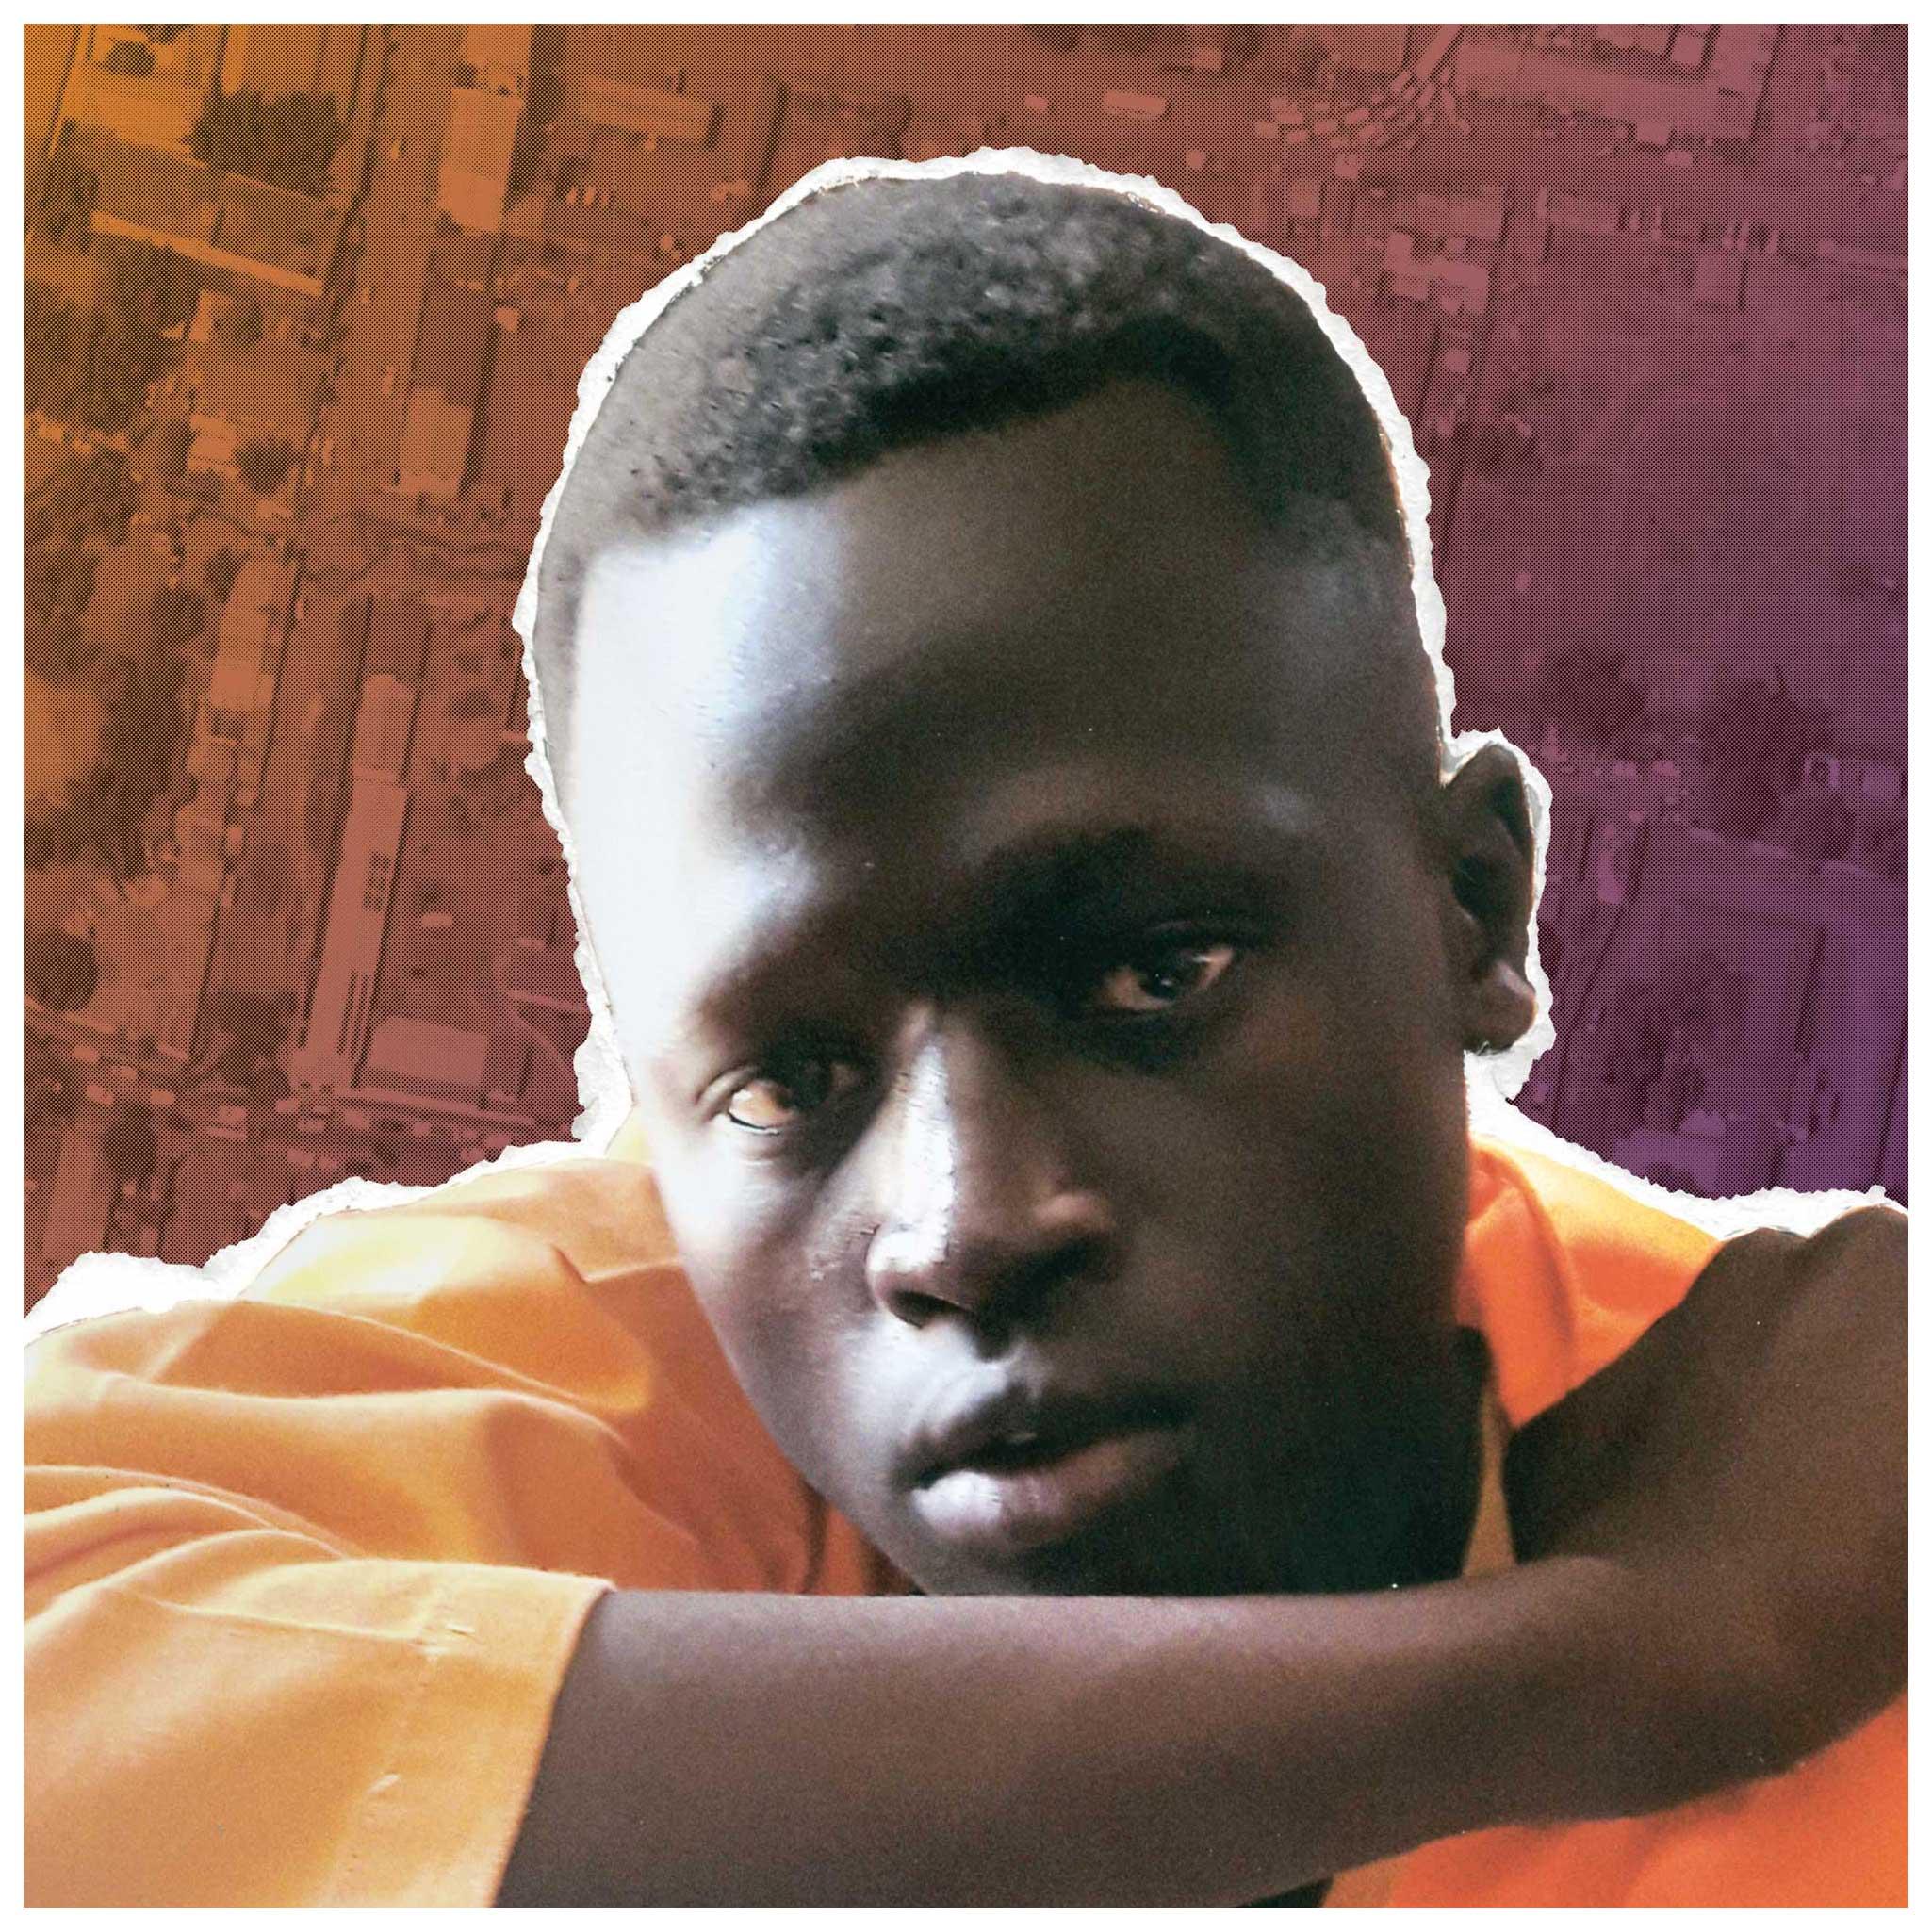 264146-Magai-Matiop--Ngong-minderjaehrig-todesstrafe-suedsudan | © Amnesty International